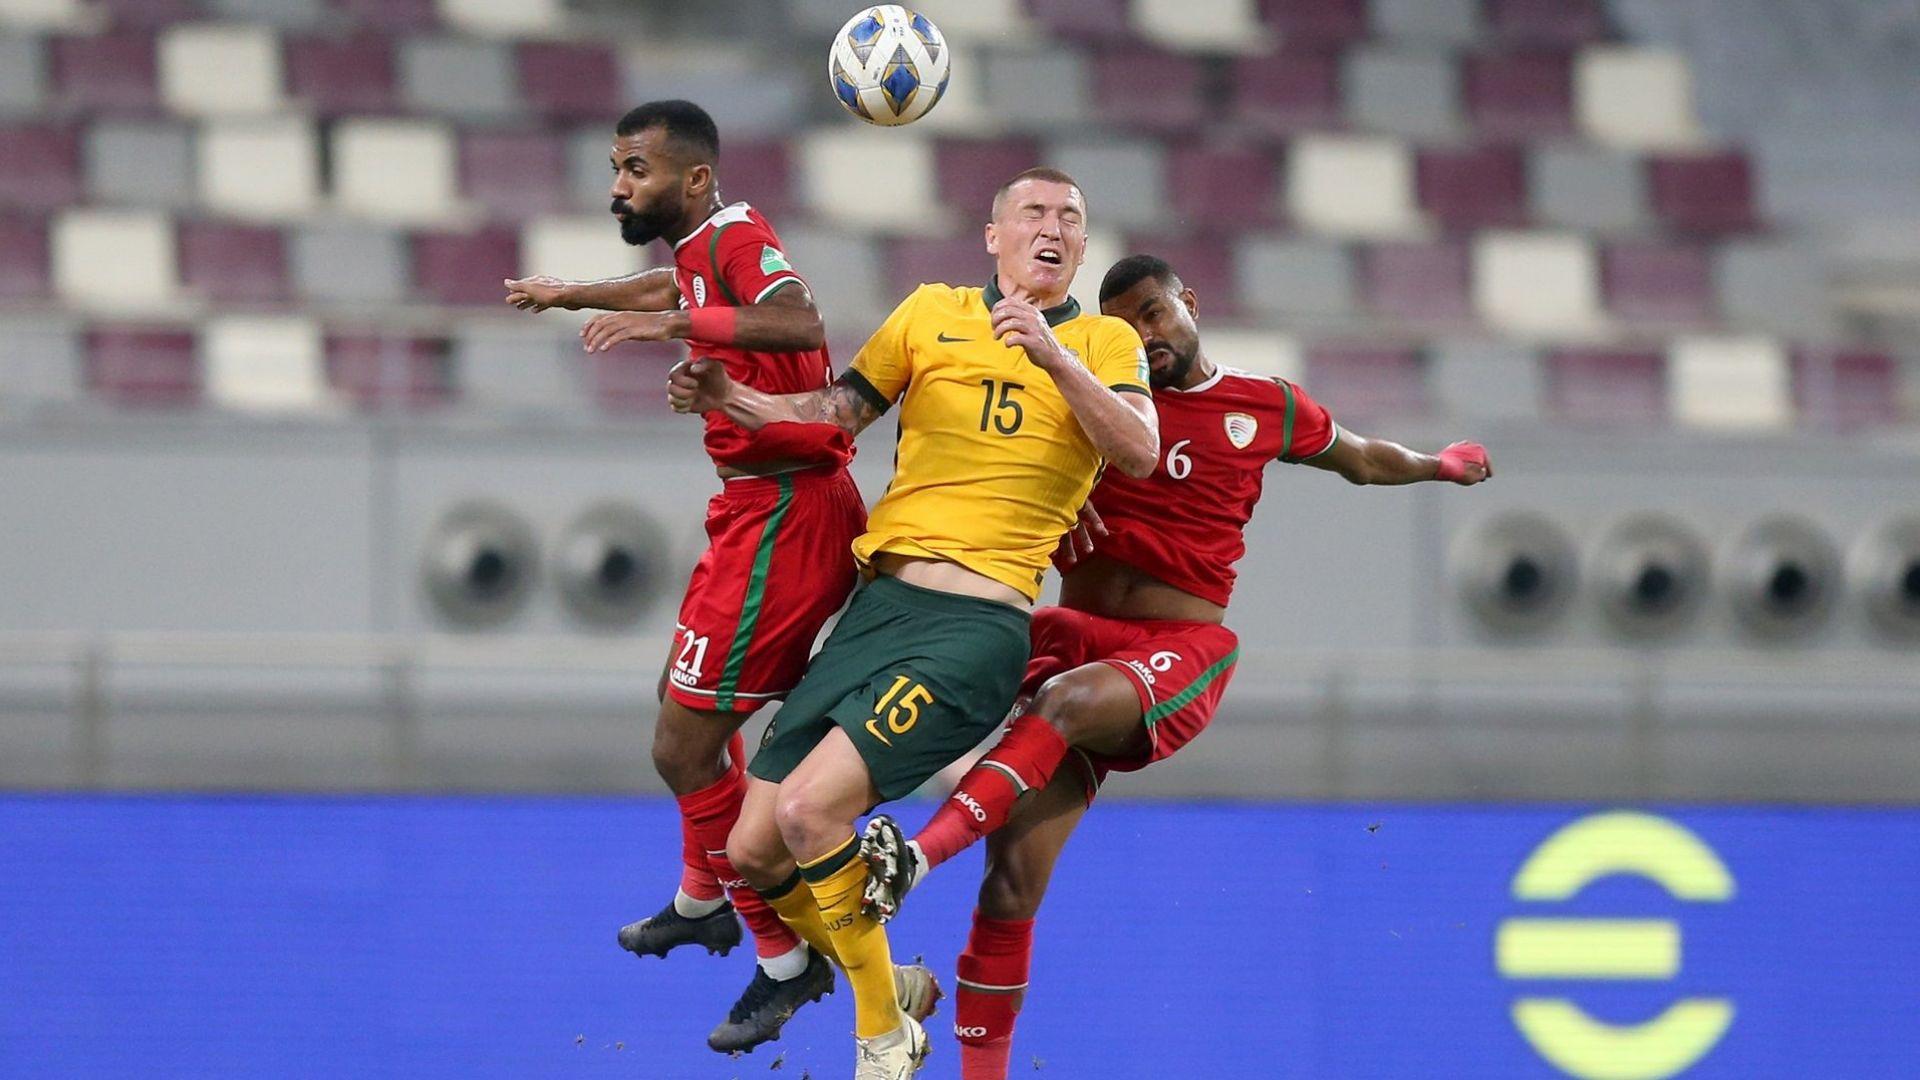 Австралия постави рекорд по поредни победи в световни квалификации